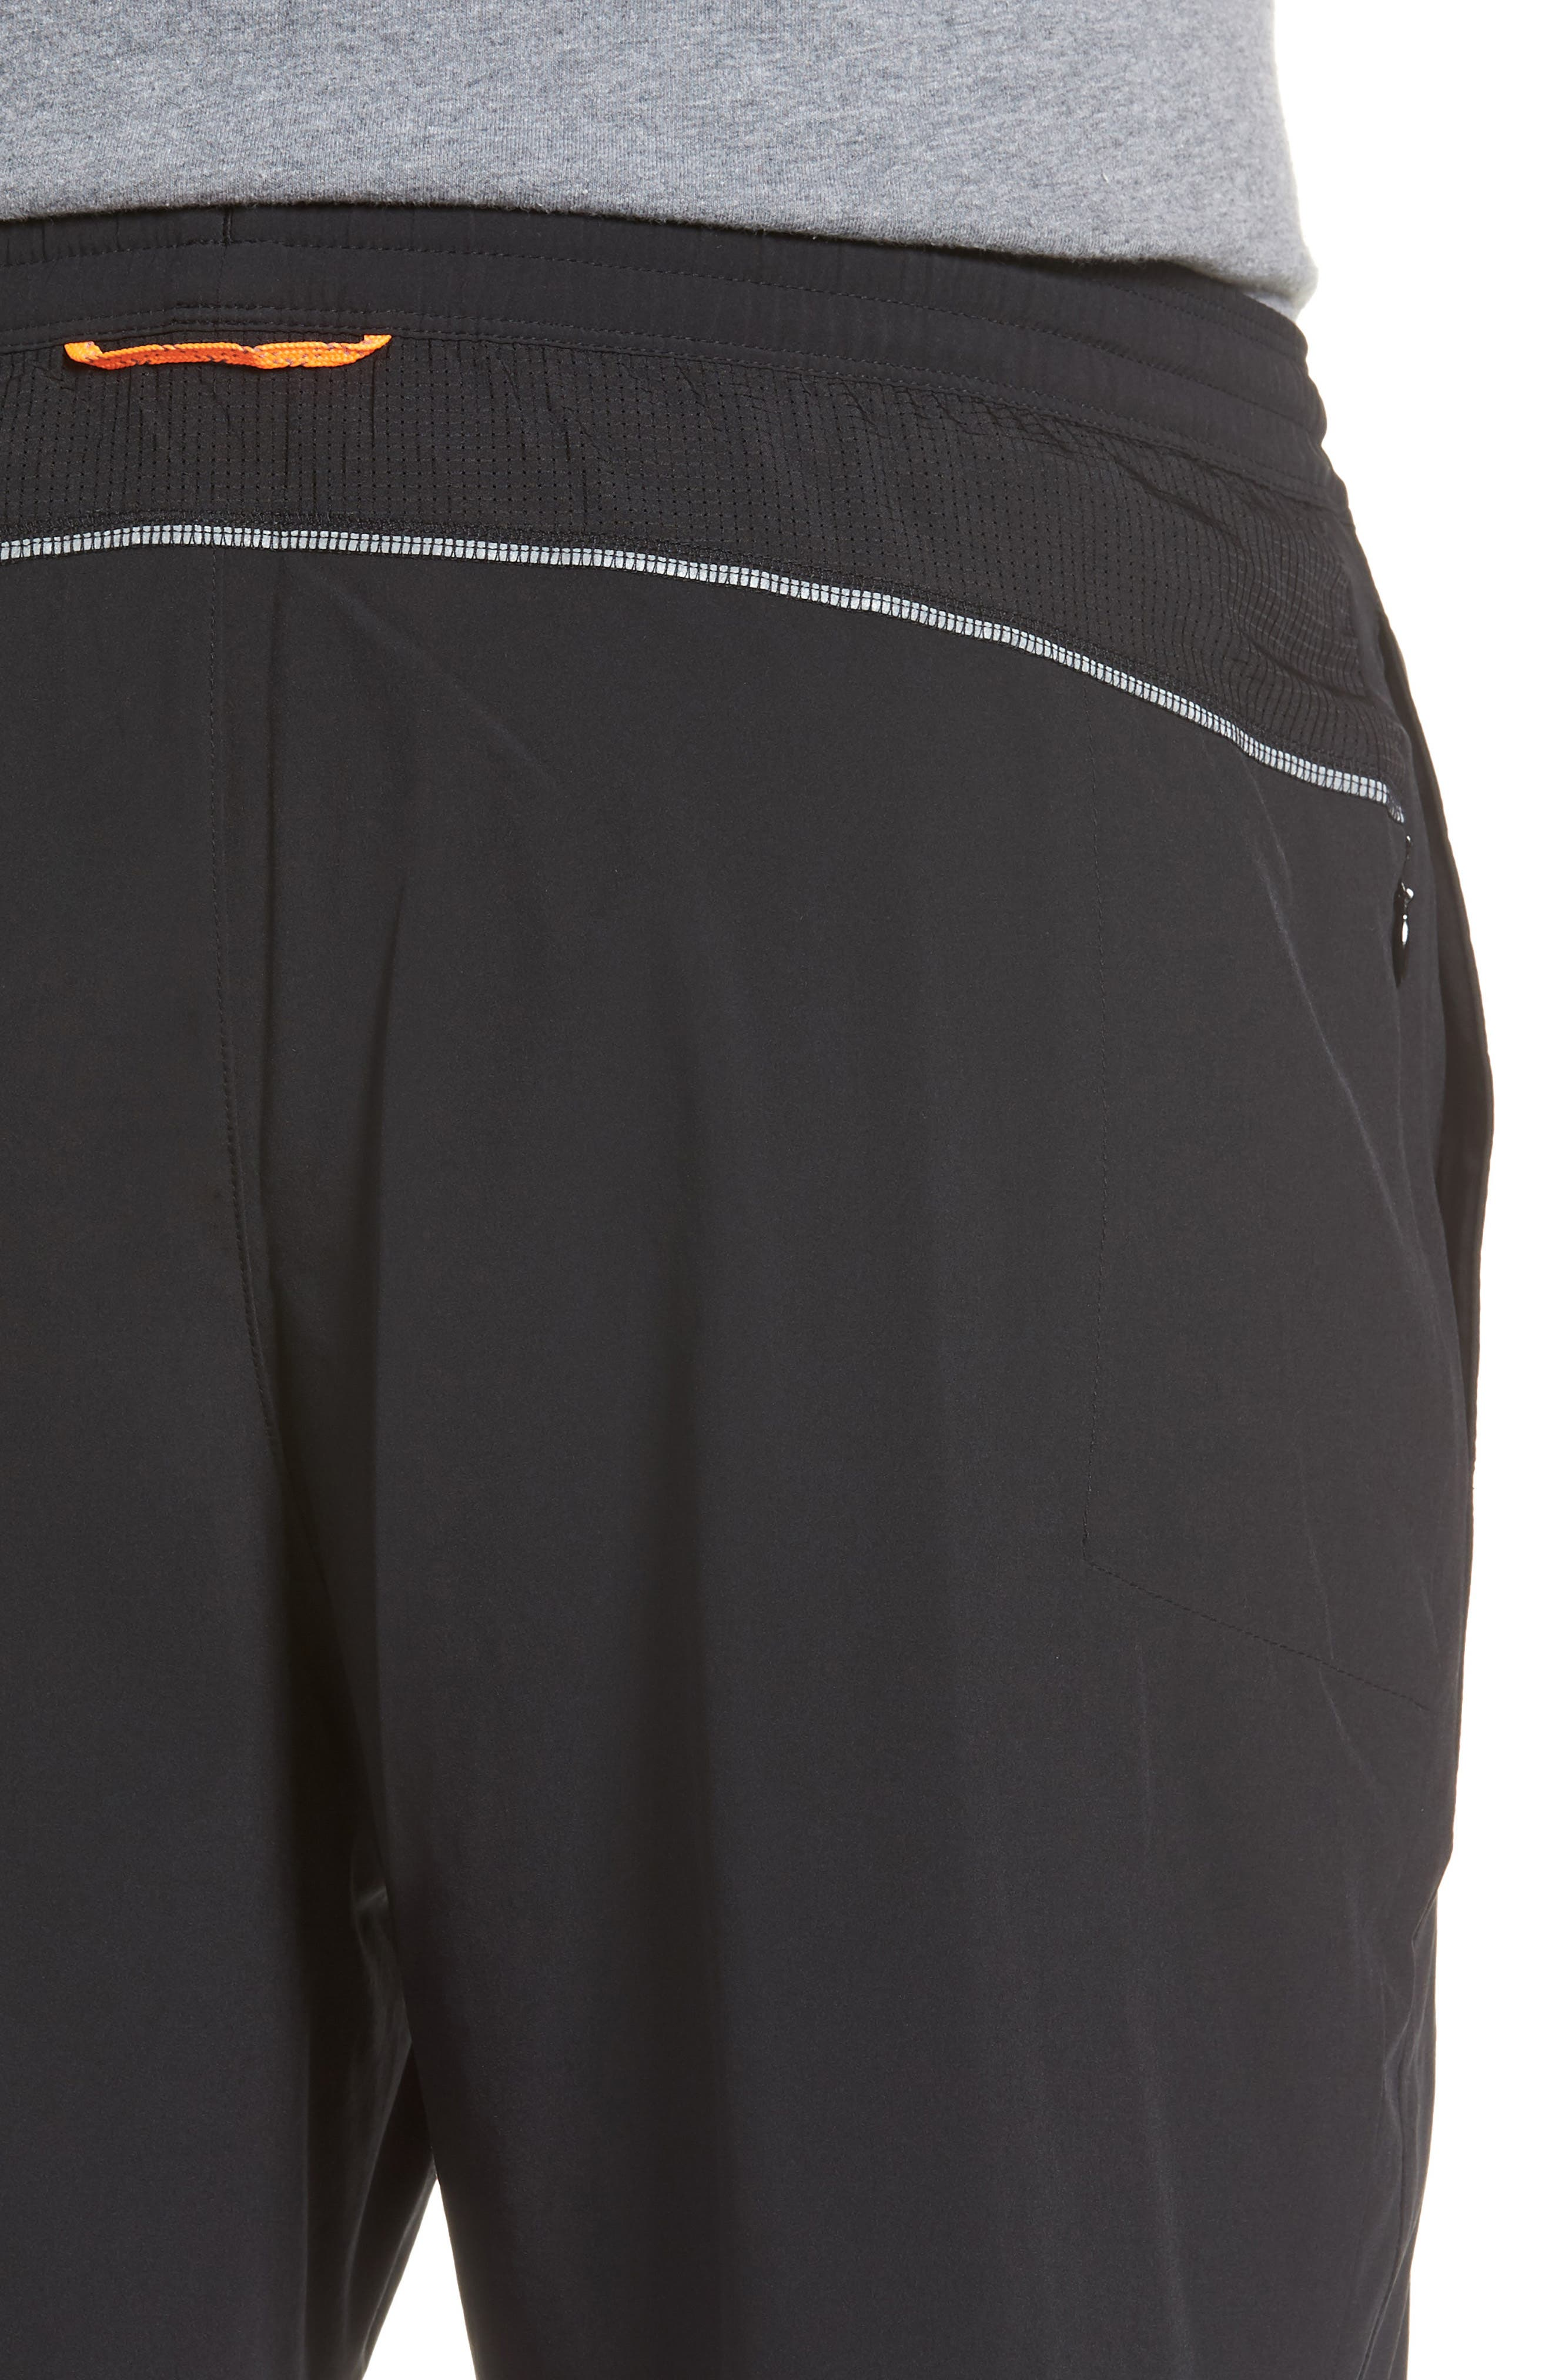 Stretch Shorts,                             Alternate thumbnail 4, color,                             001